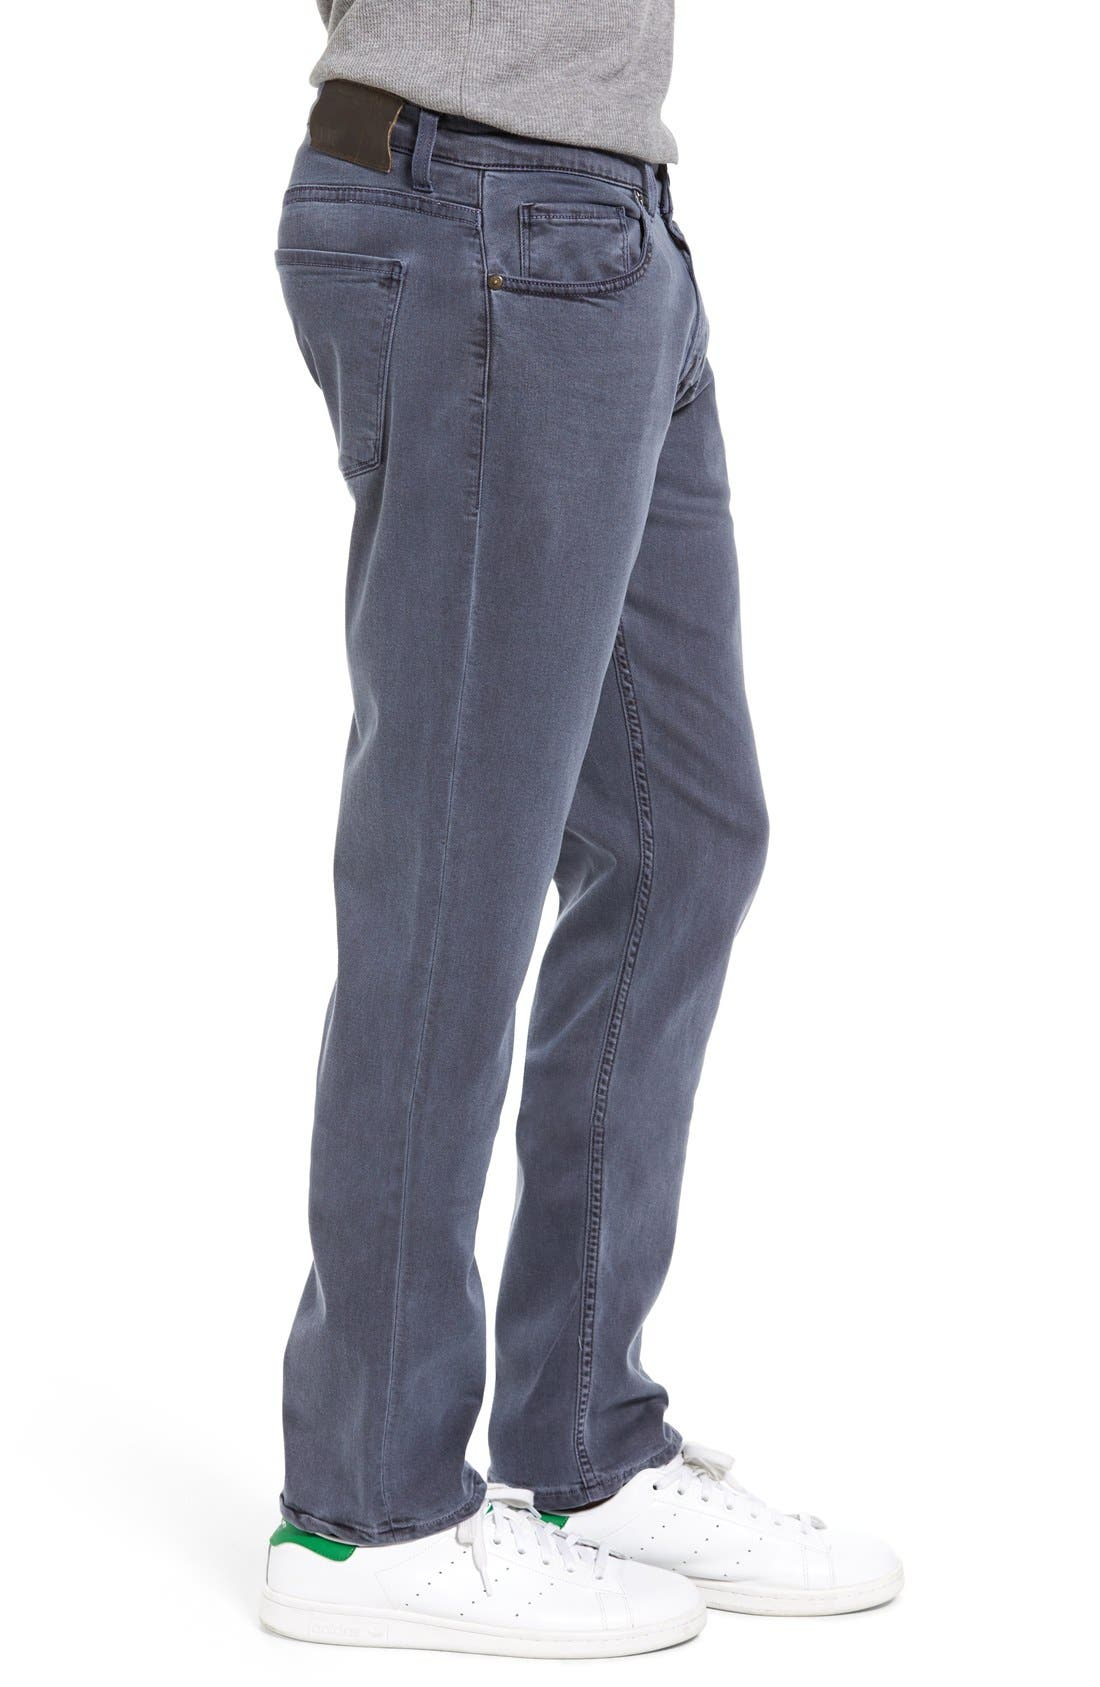 Transcend - Federal Slim Straight Leg Jeans,                             Alternate thumbnail 4, color,                             VINTAGE NAVY